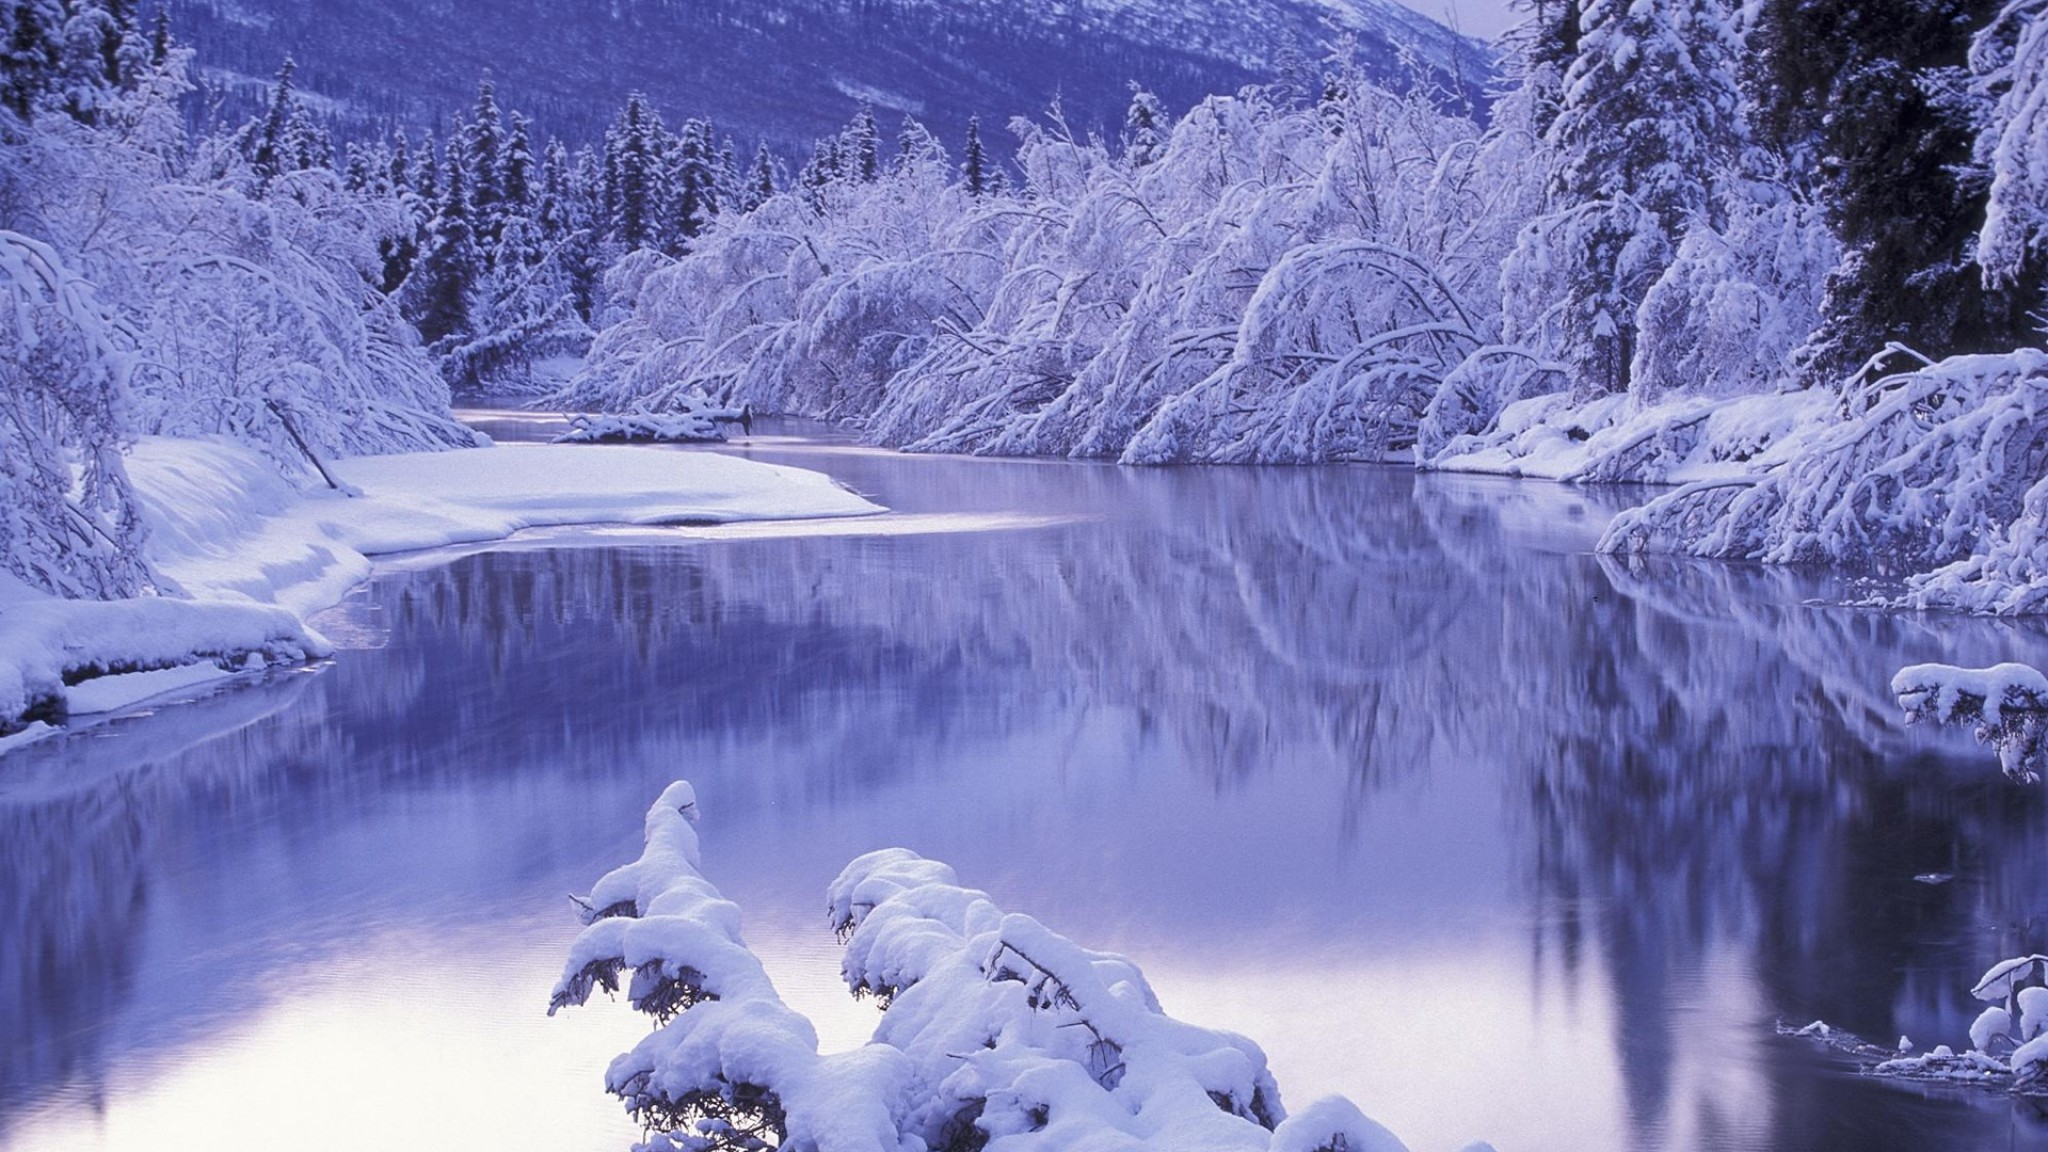 Preview wallpaper snow, white, winter, nature, scenery 2048×1152